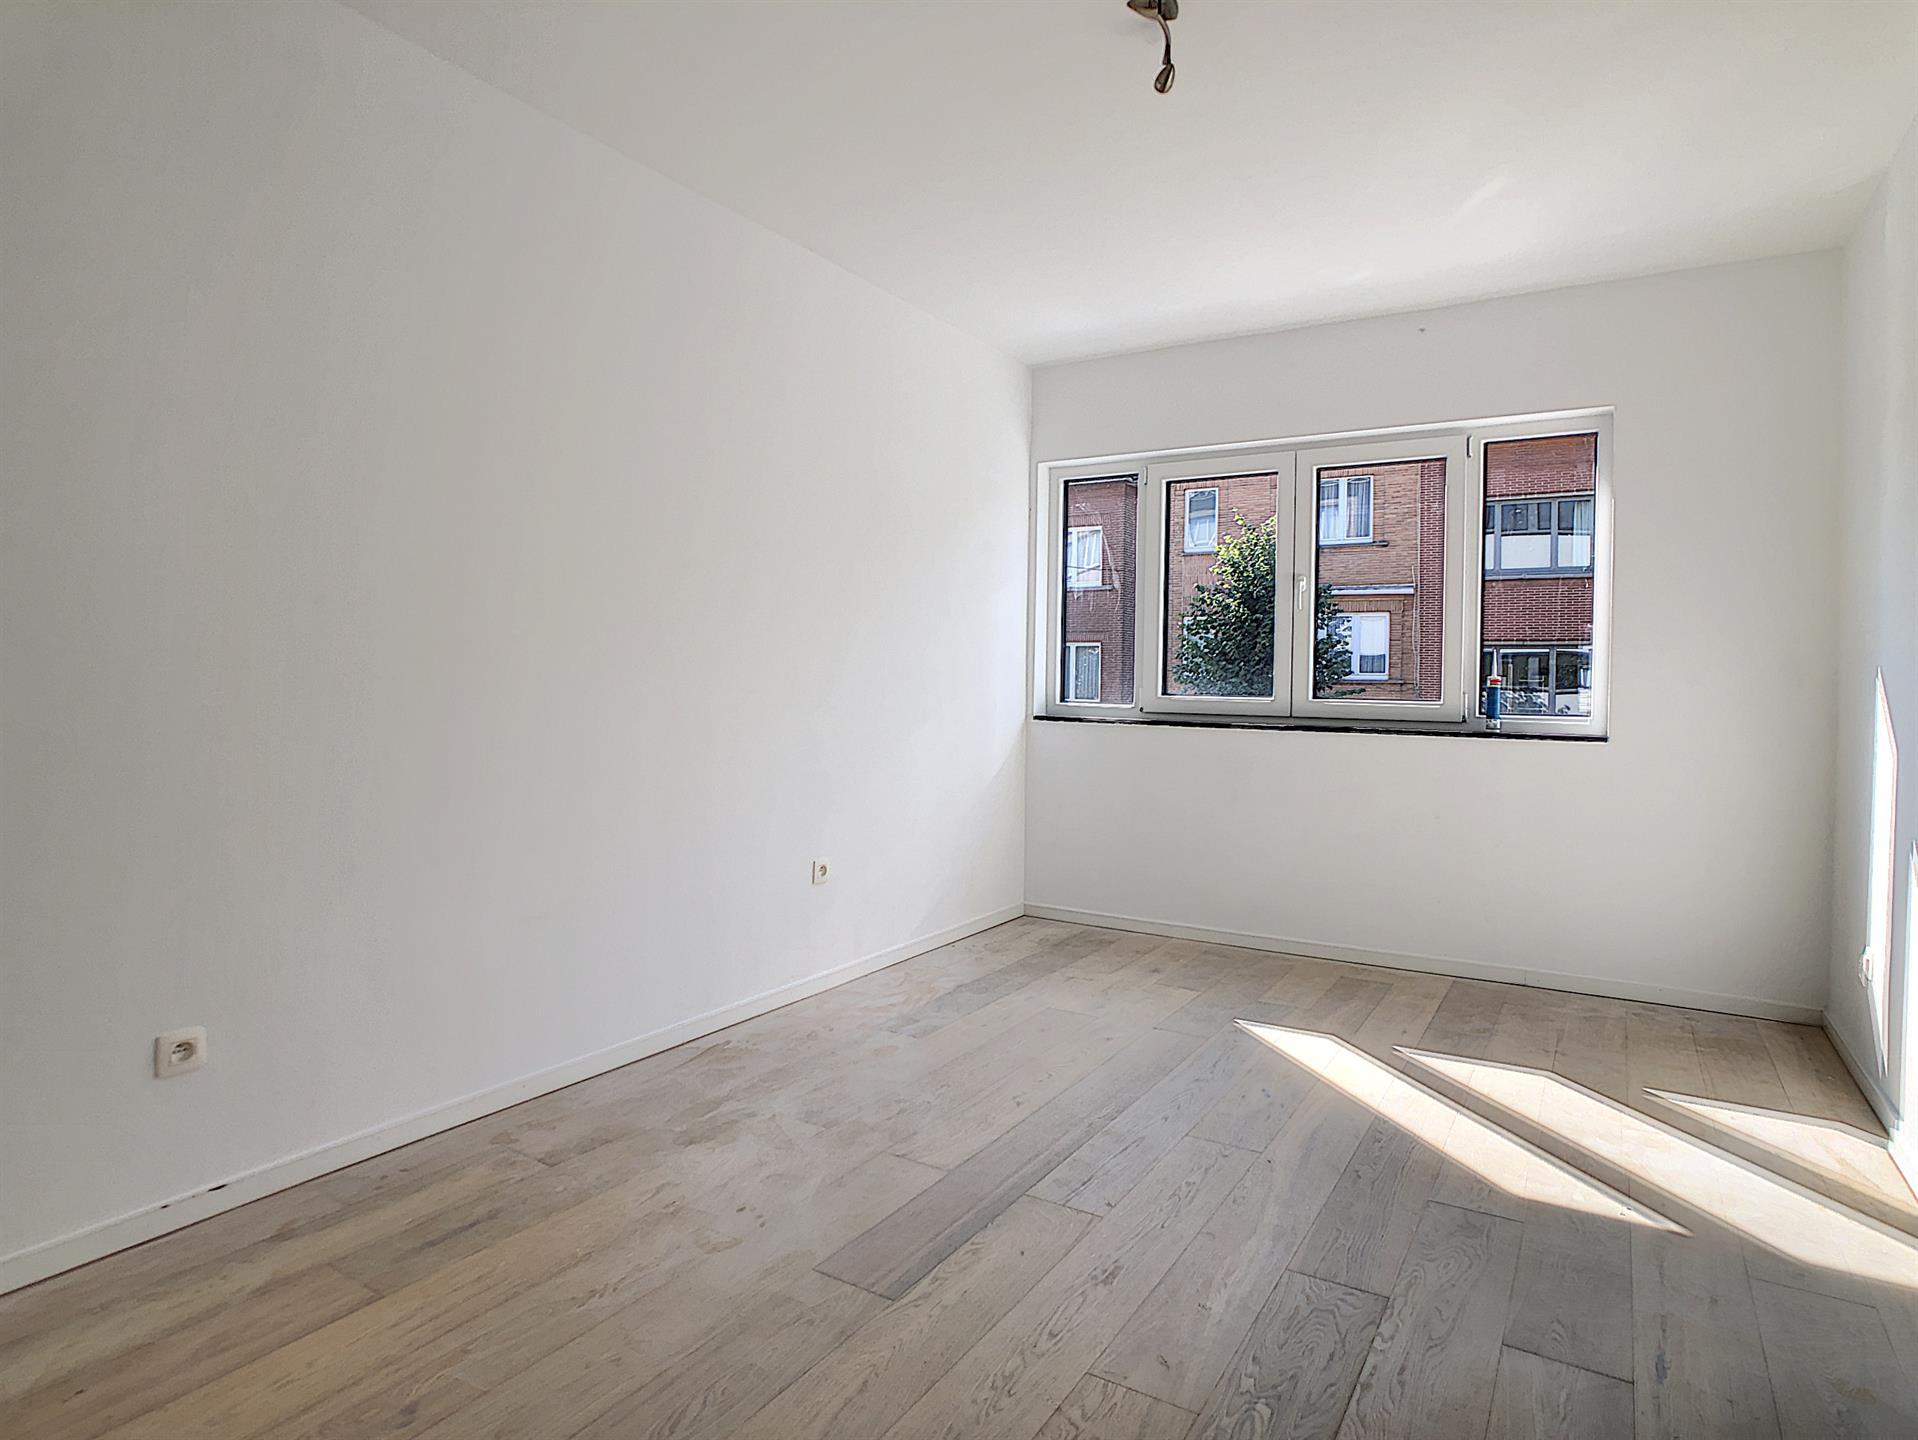 Appartement - Anderlecht - #4252375-6